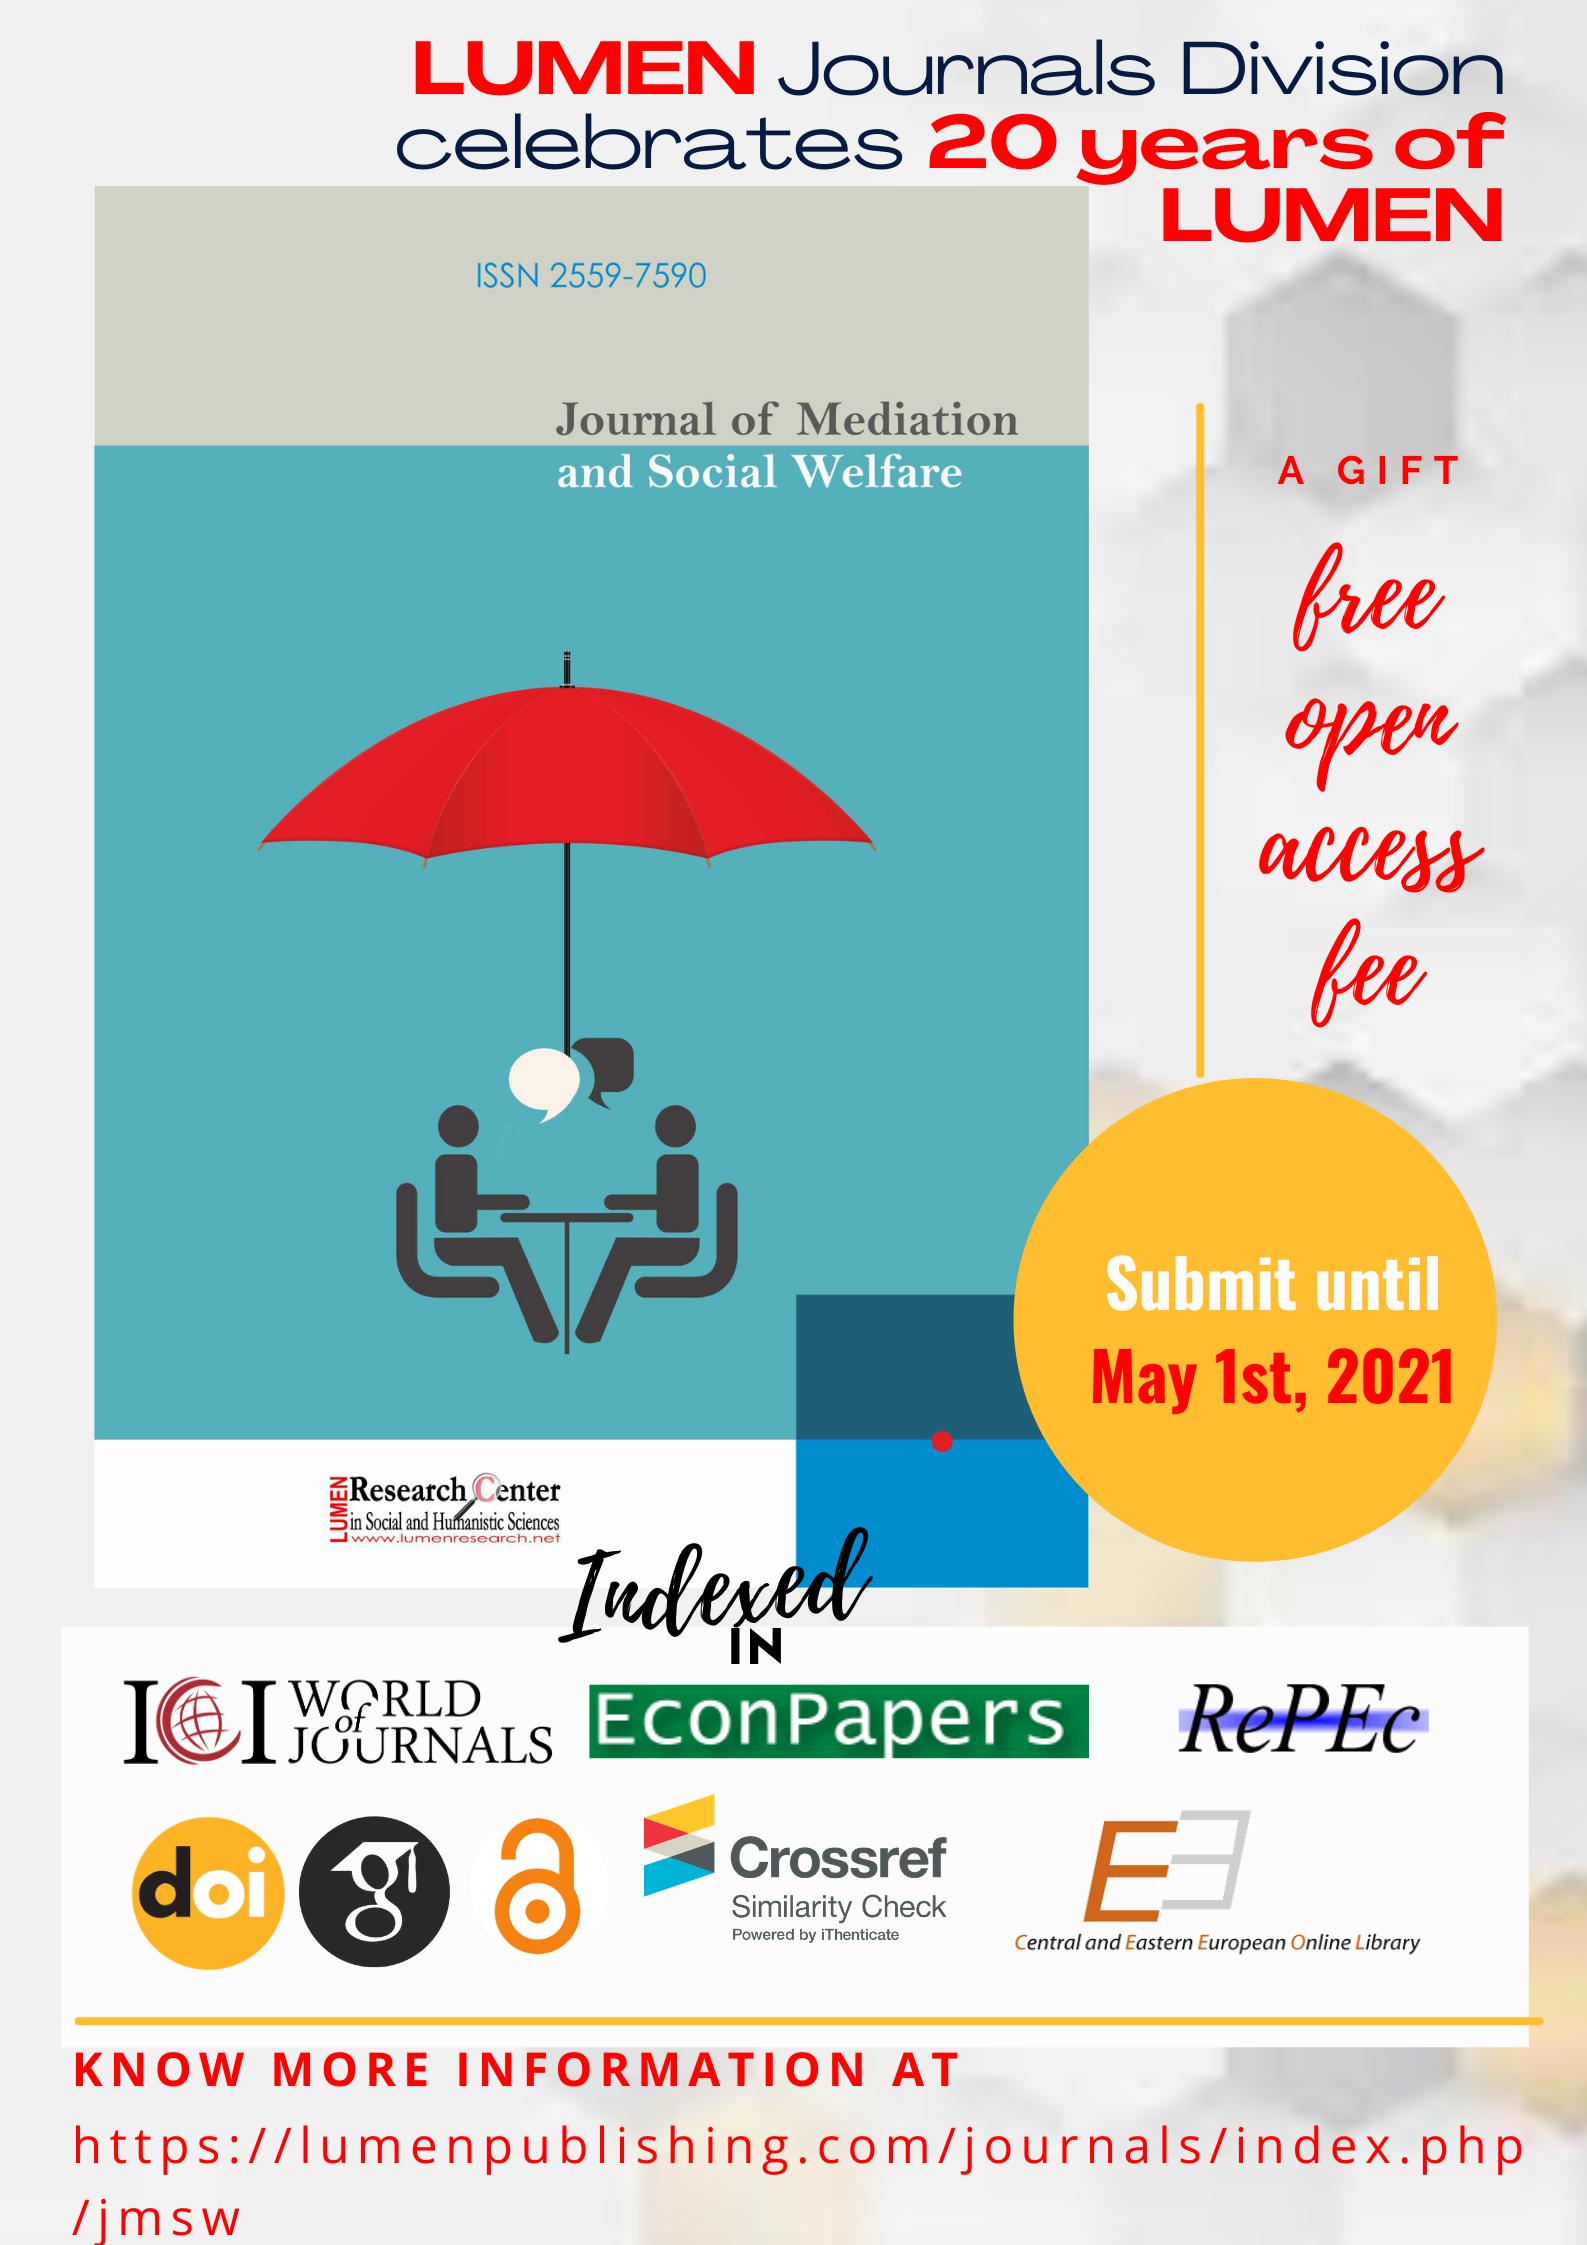 Publish your work with LUMEN May1st ree LUMEN JMSW journals